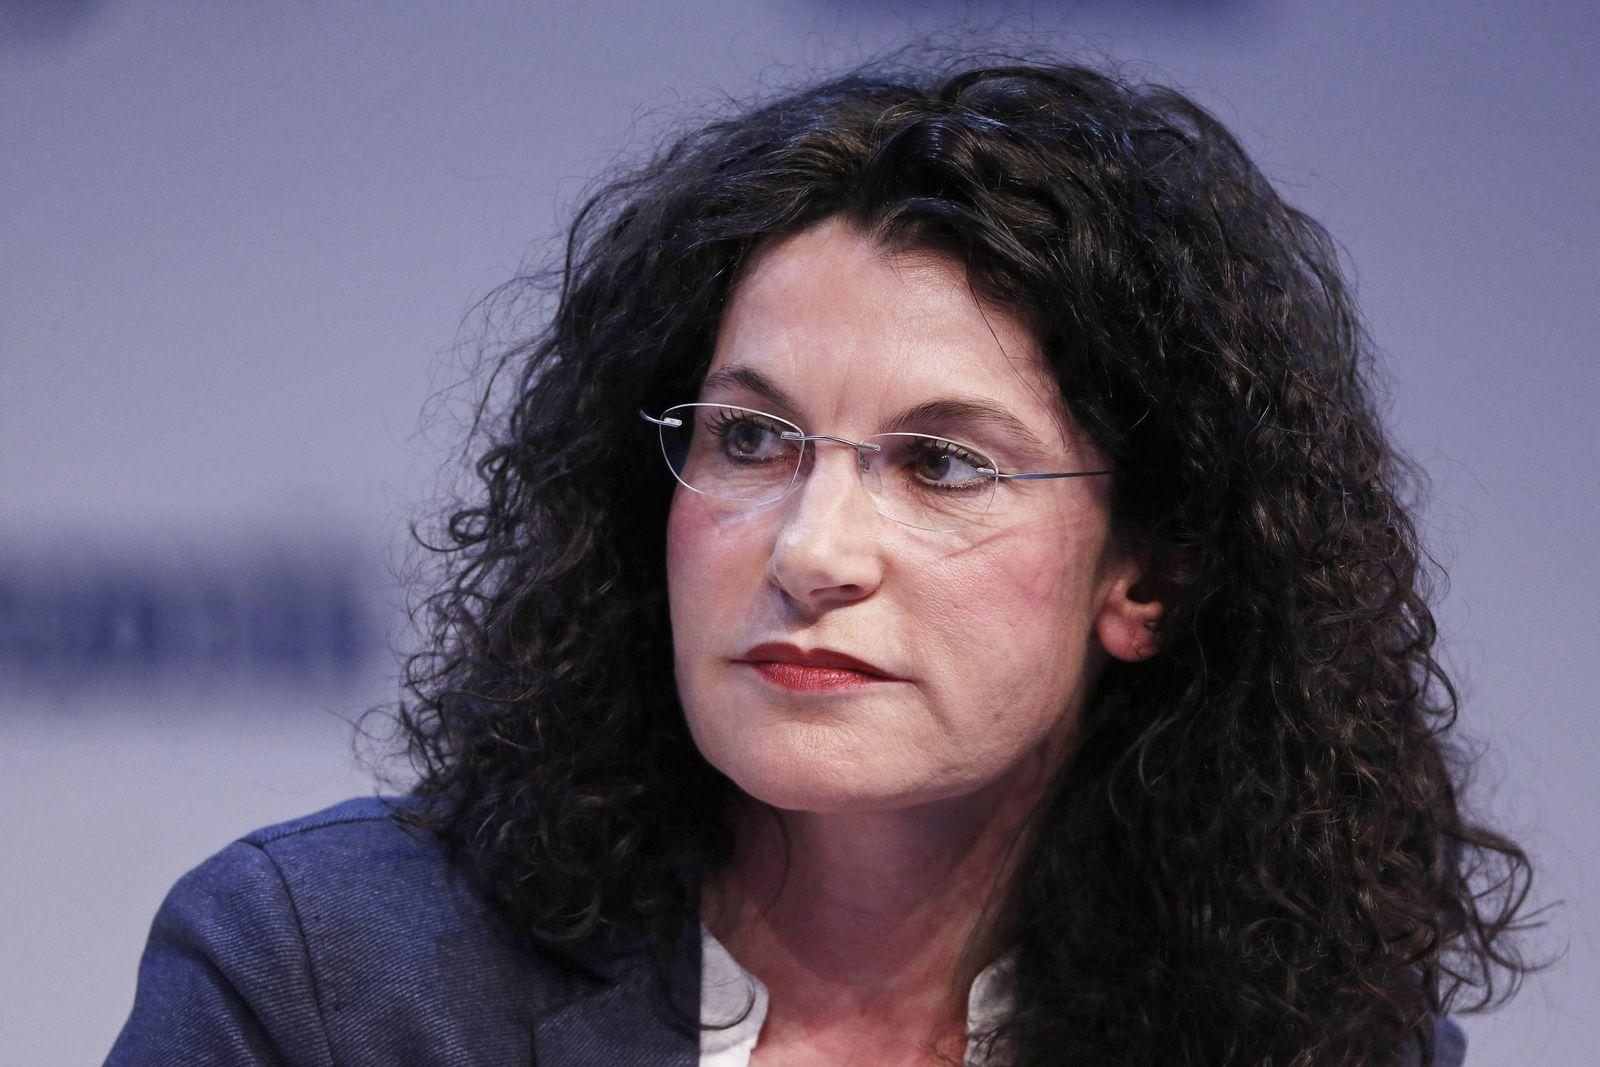 D¸sseldorf, Deutschland, SPOBIS, Sportbusiness Kongress in D¸sseldorf am 30.01.2017 Die OPEL- Marketingchefin Tina M‹LL